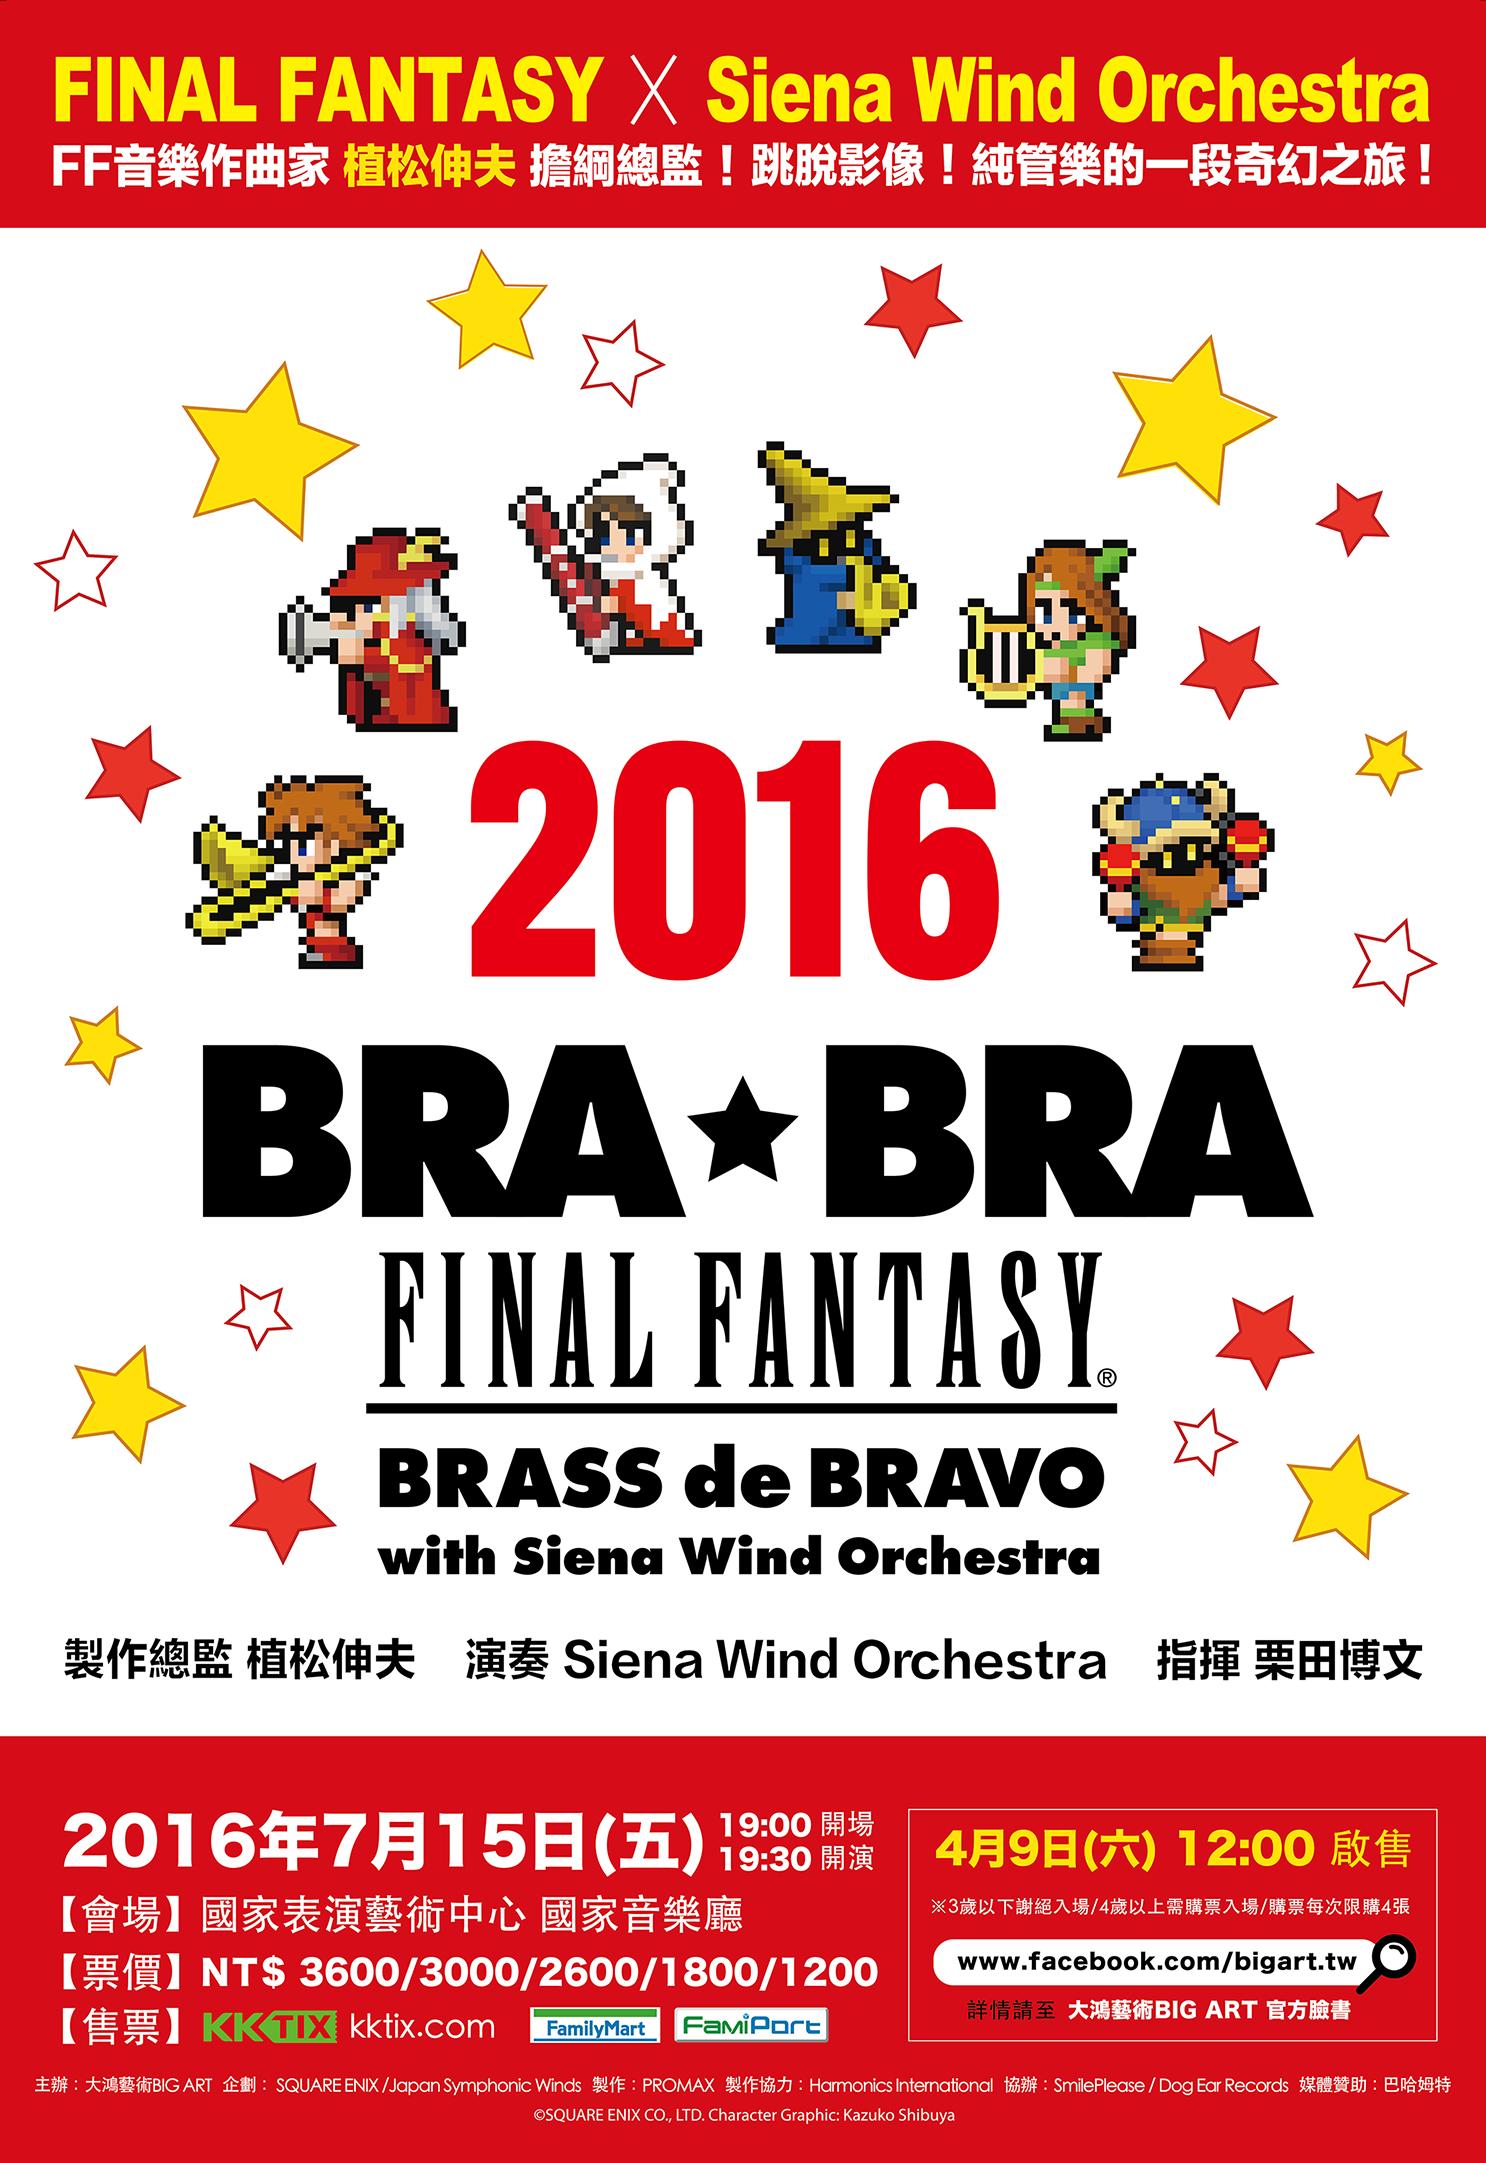 brabra_finalfantasy台湾